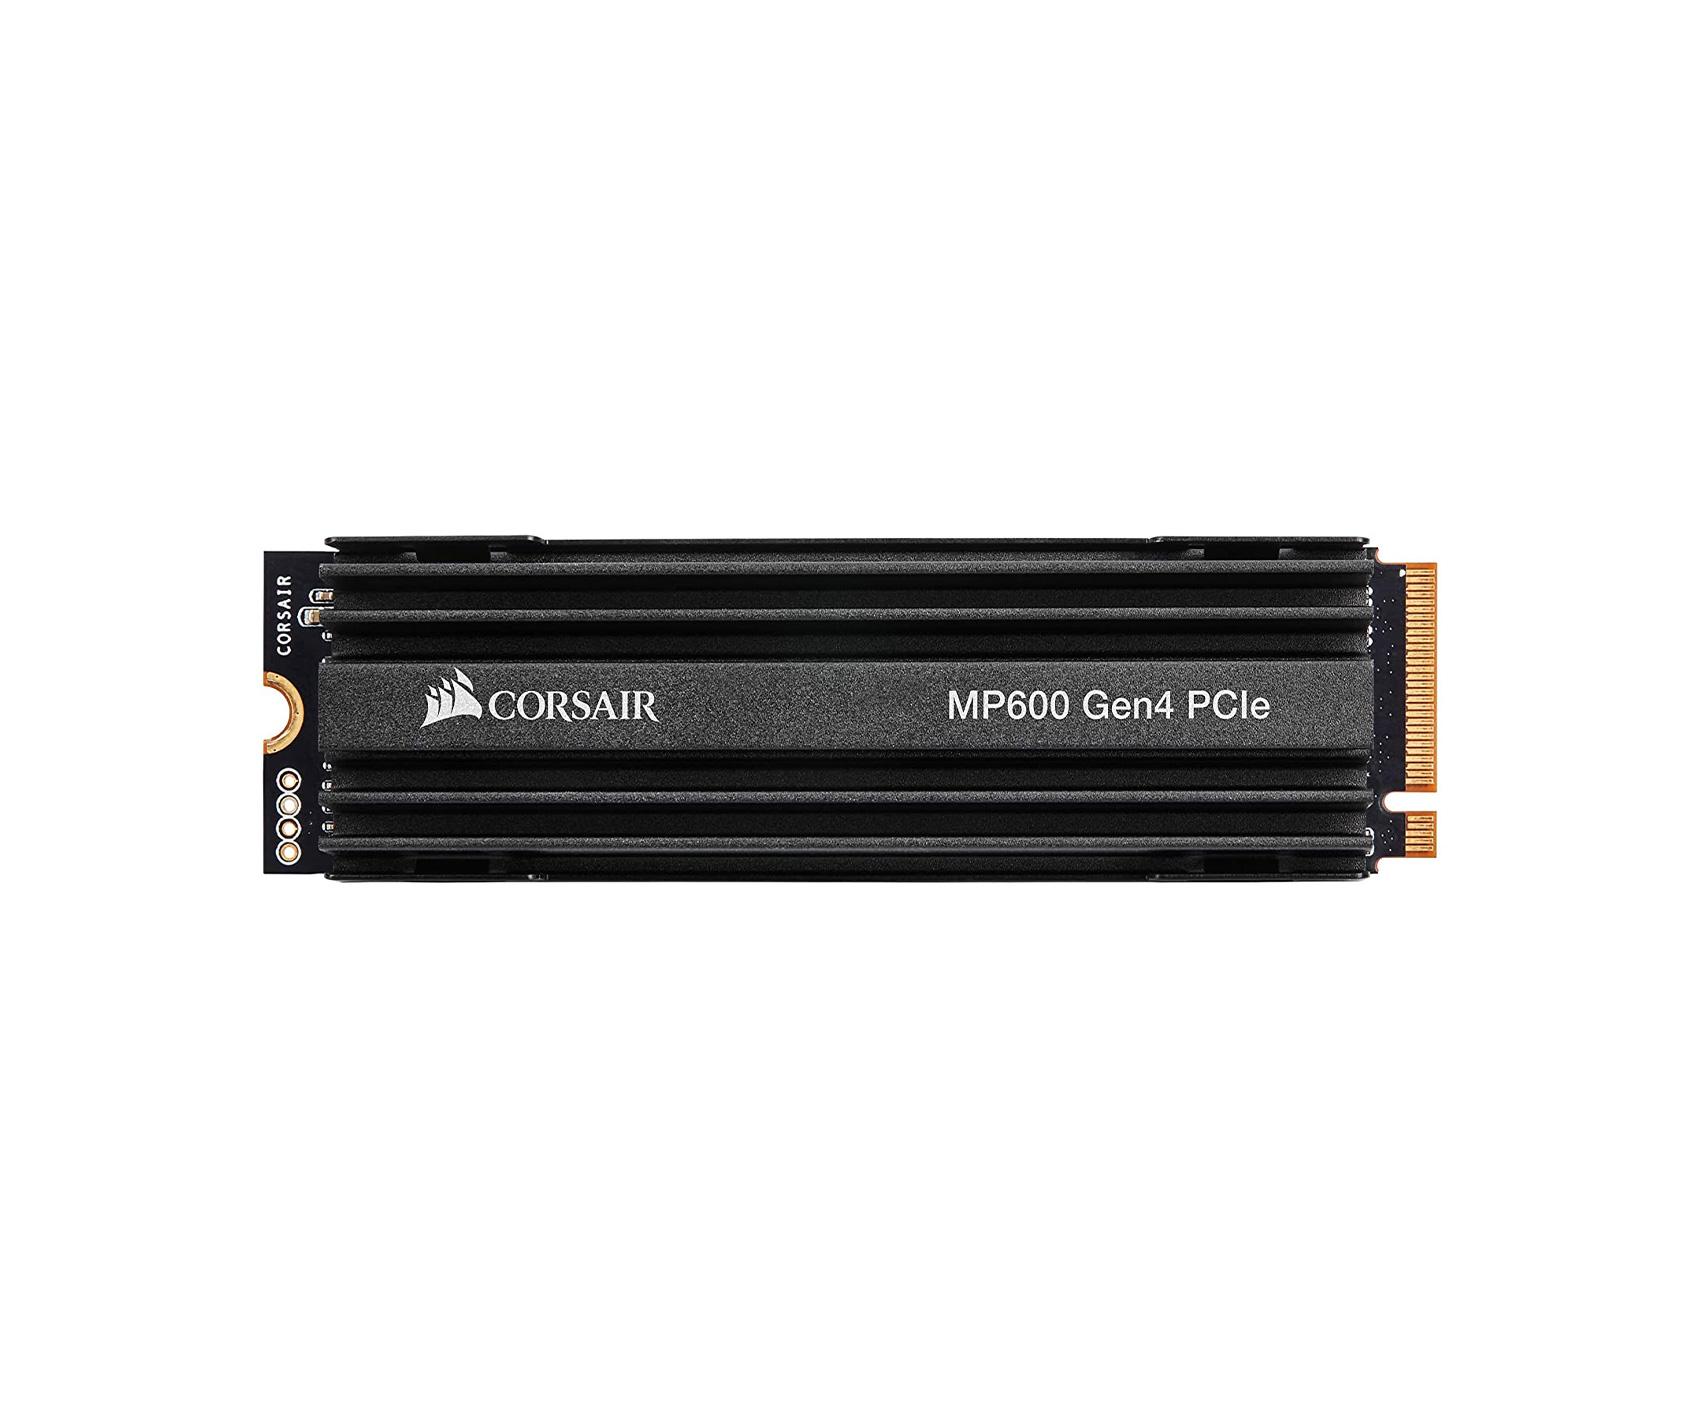 Corsair Force Series Gen.4 PCIe MP600 500GB NVMe M.2 SSD